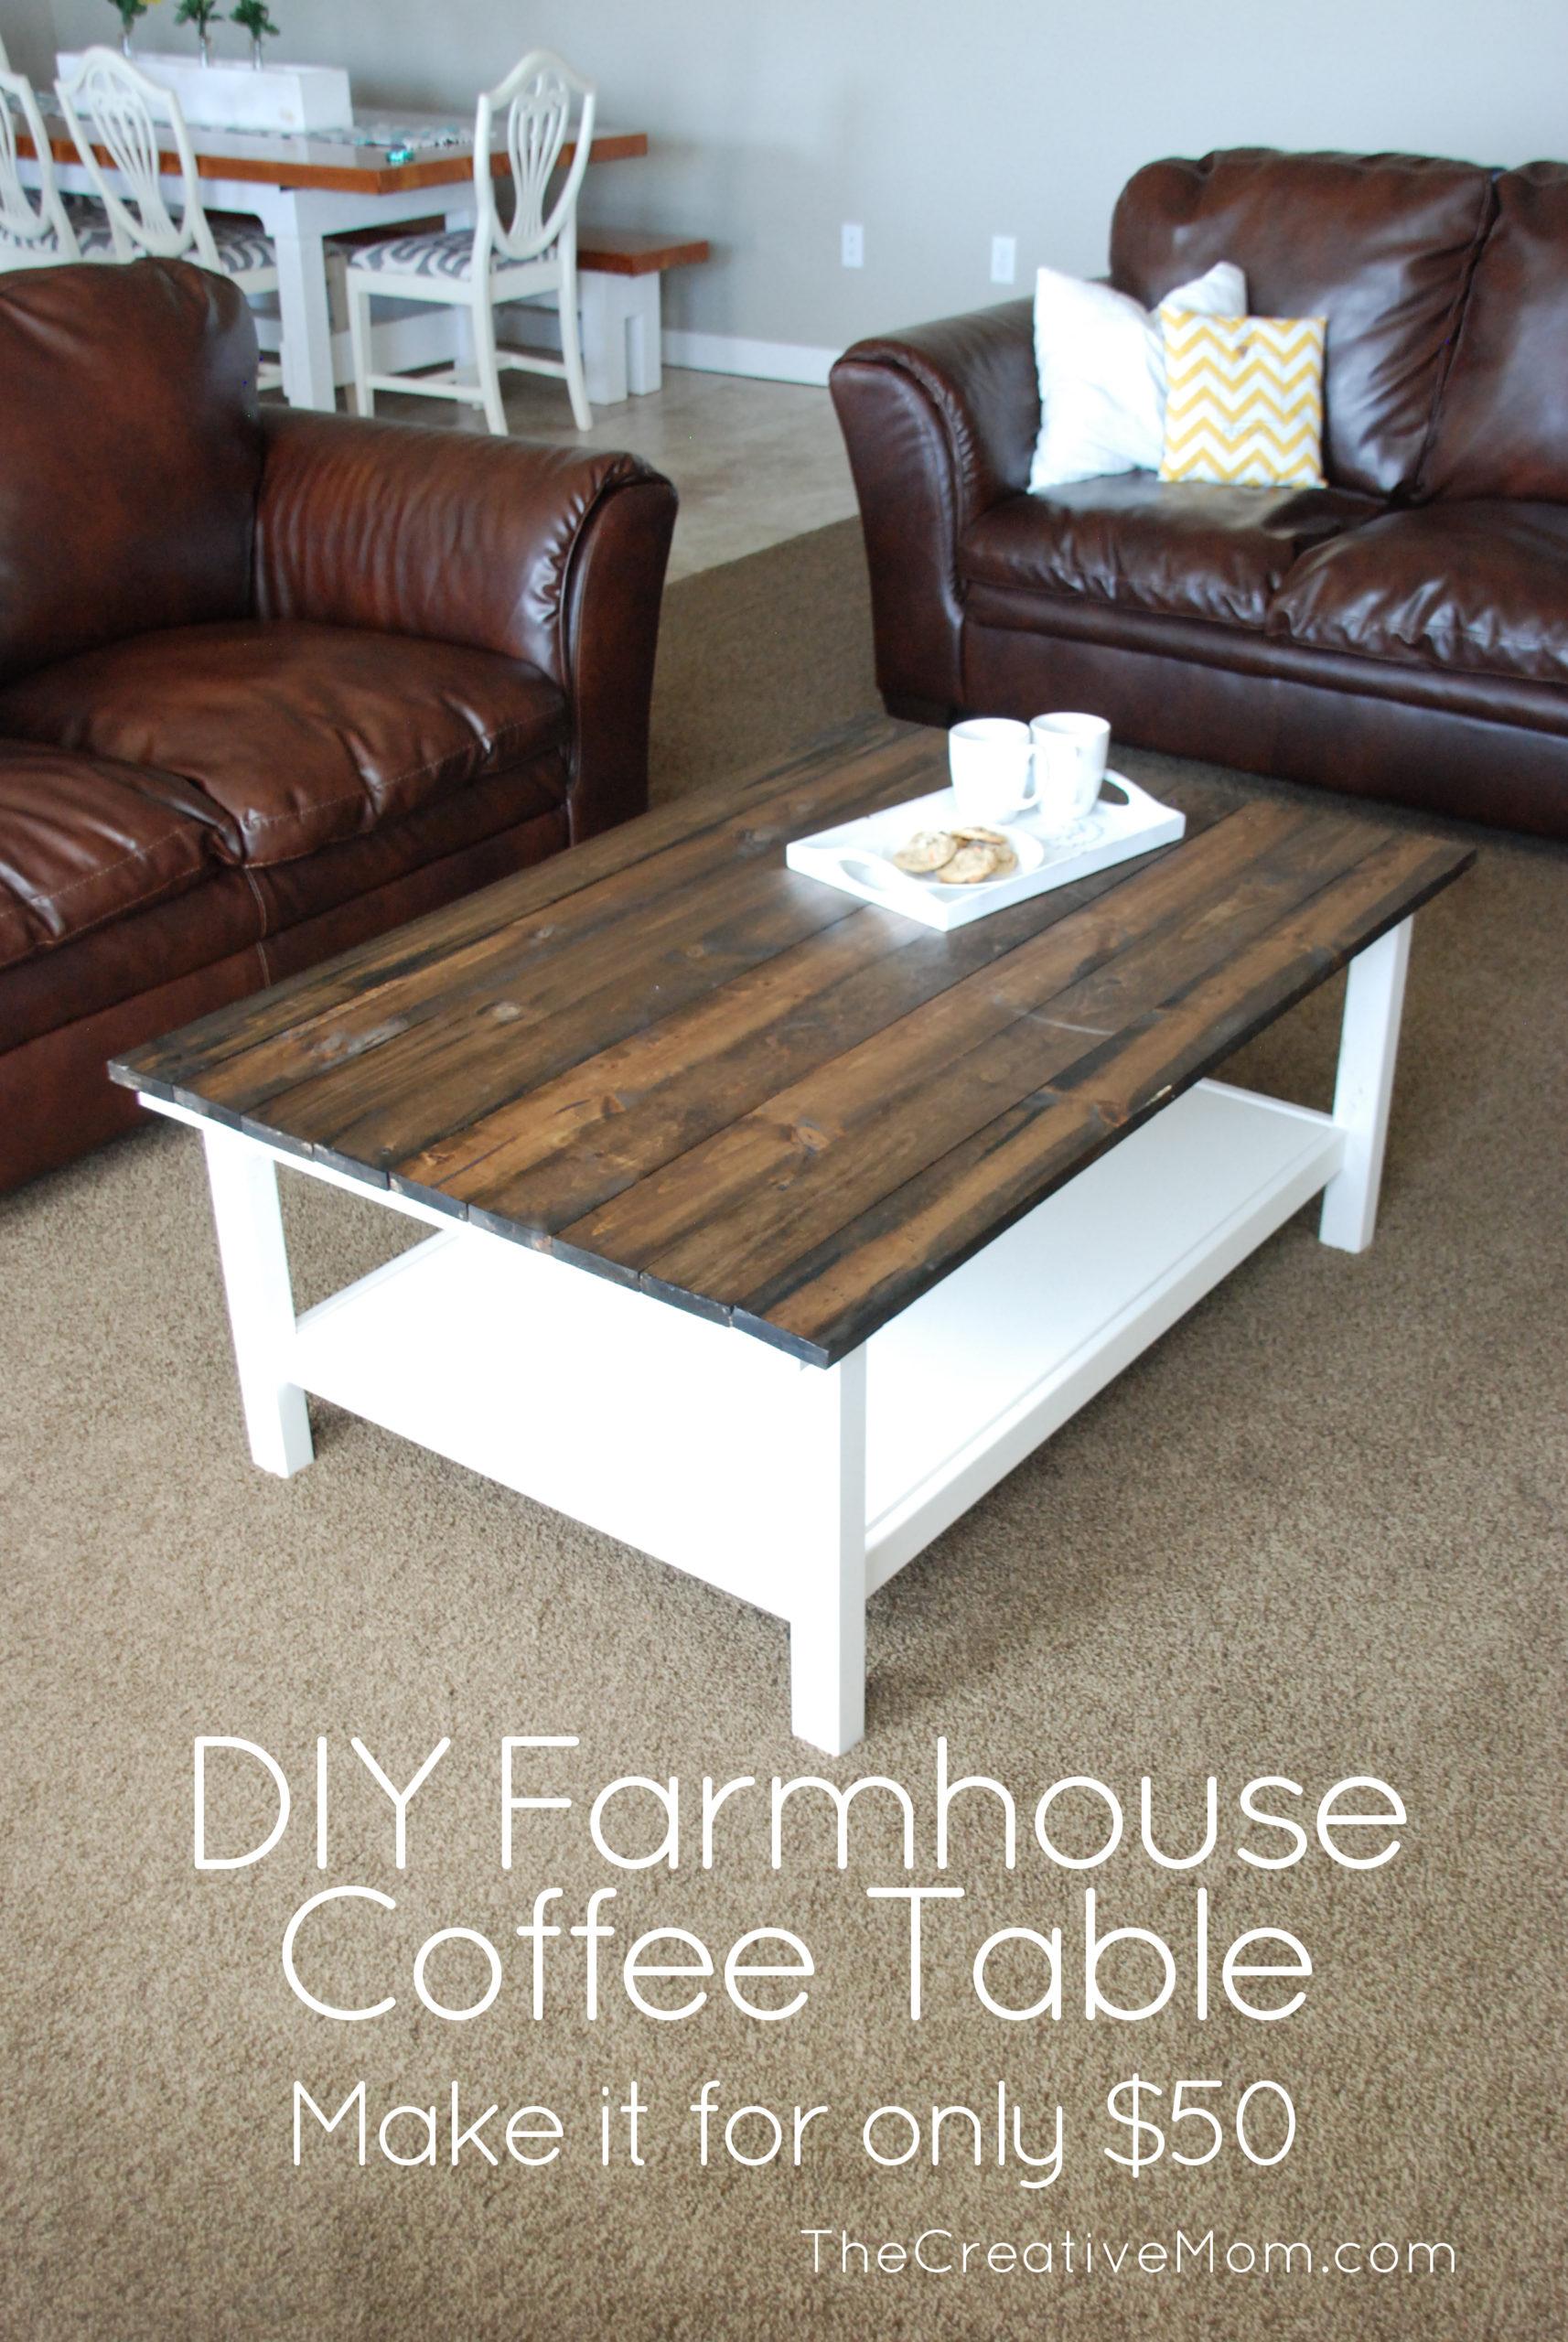 Ikea Hack- DIY Farmhouse Coffee Table